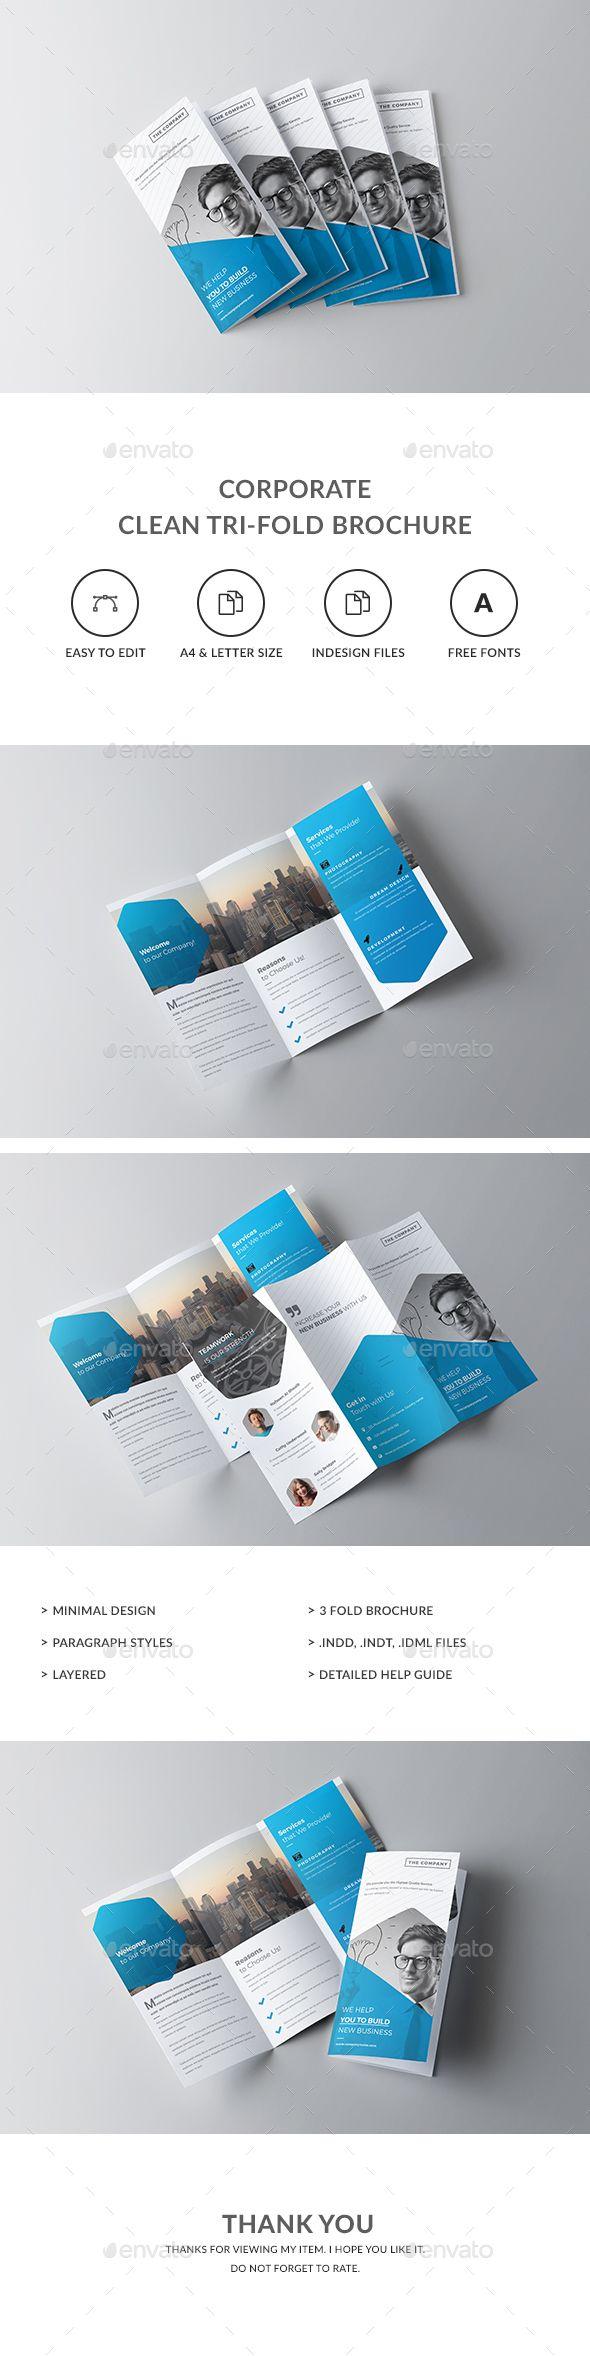 Tri-fold Brochure Template InDesign INDD